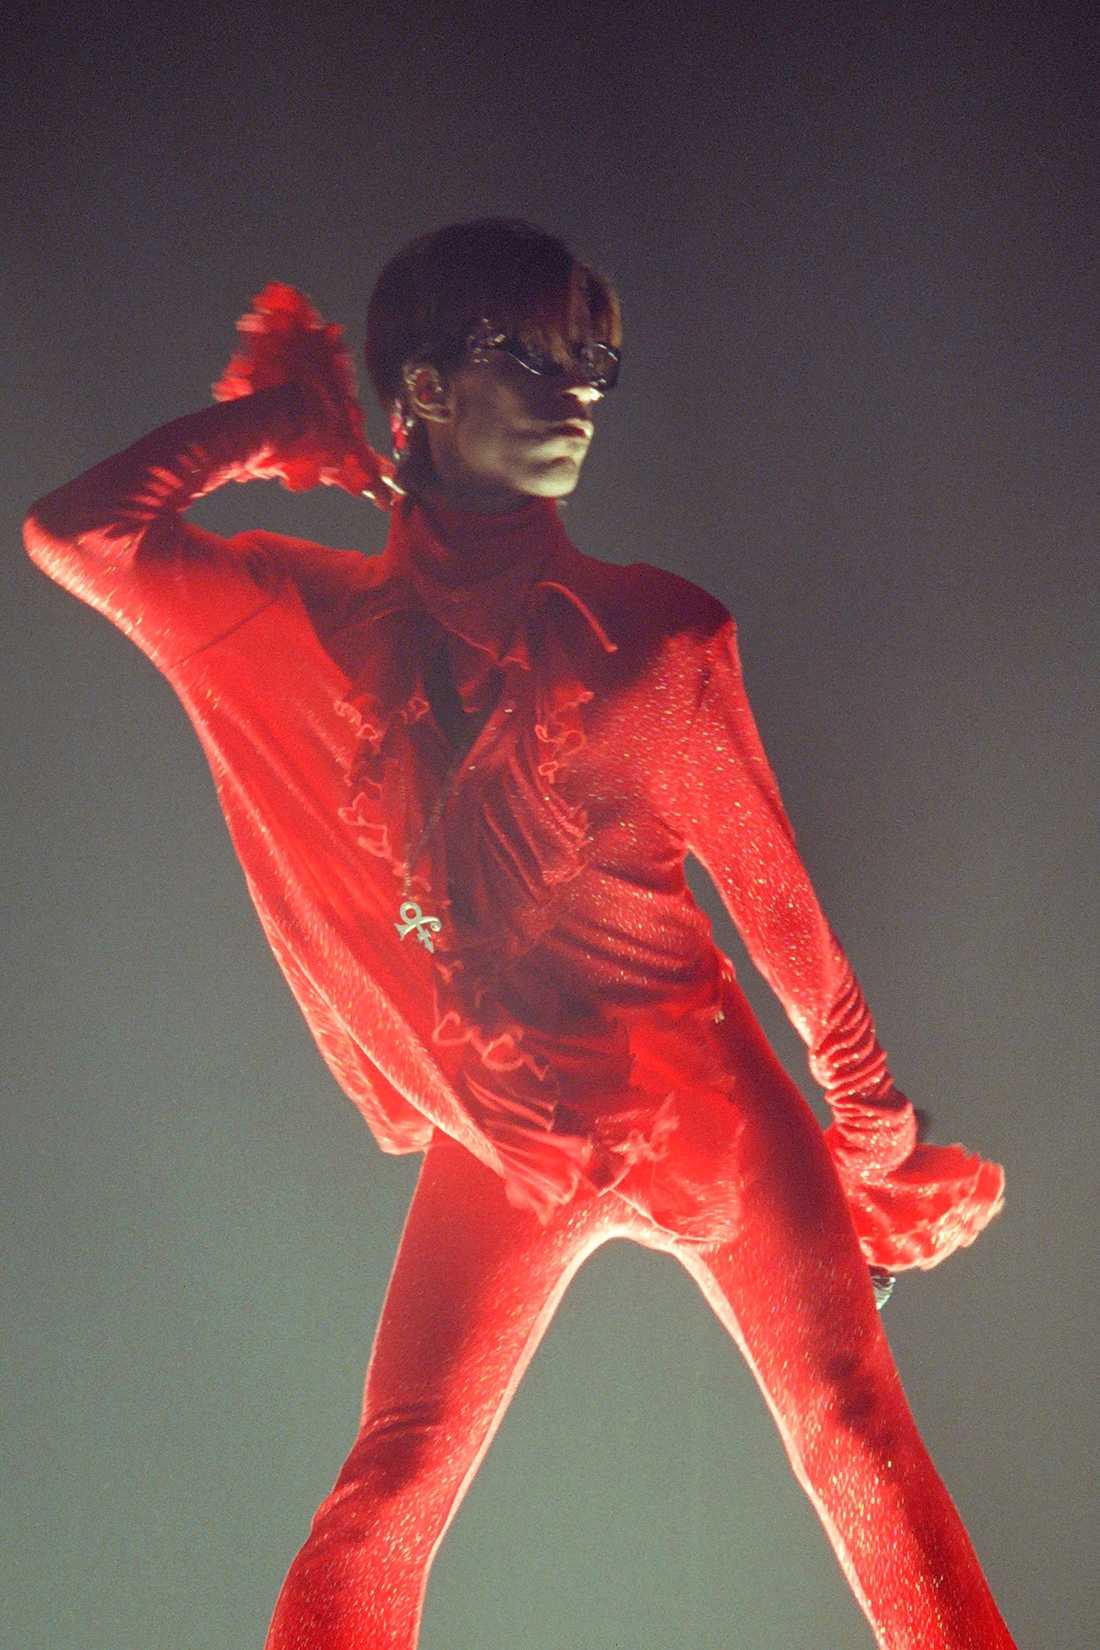 Prince i Pariskonsert 1998.